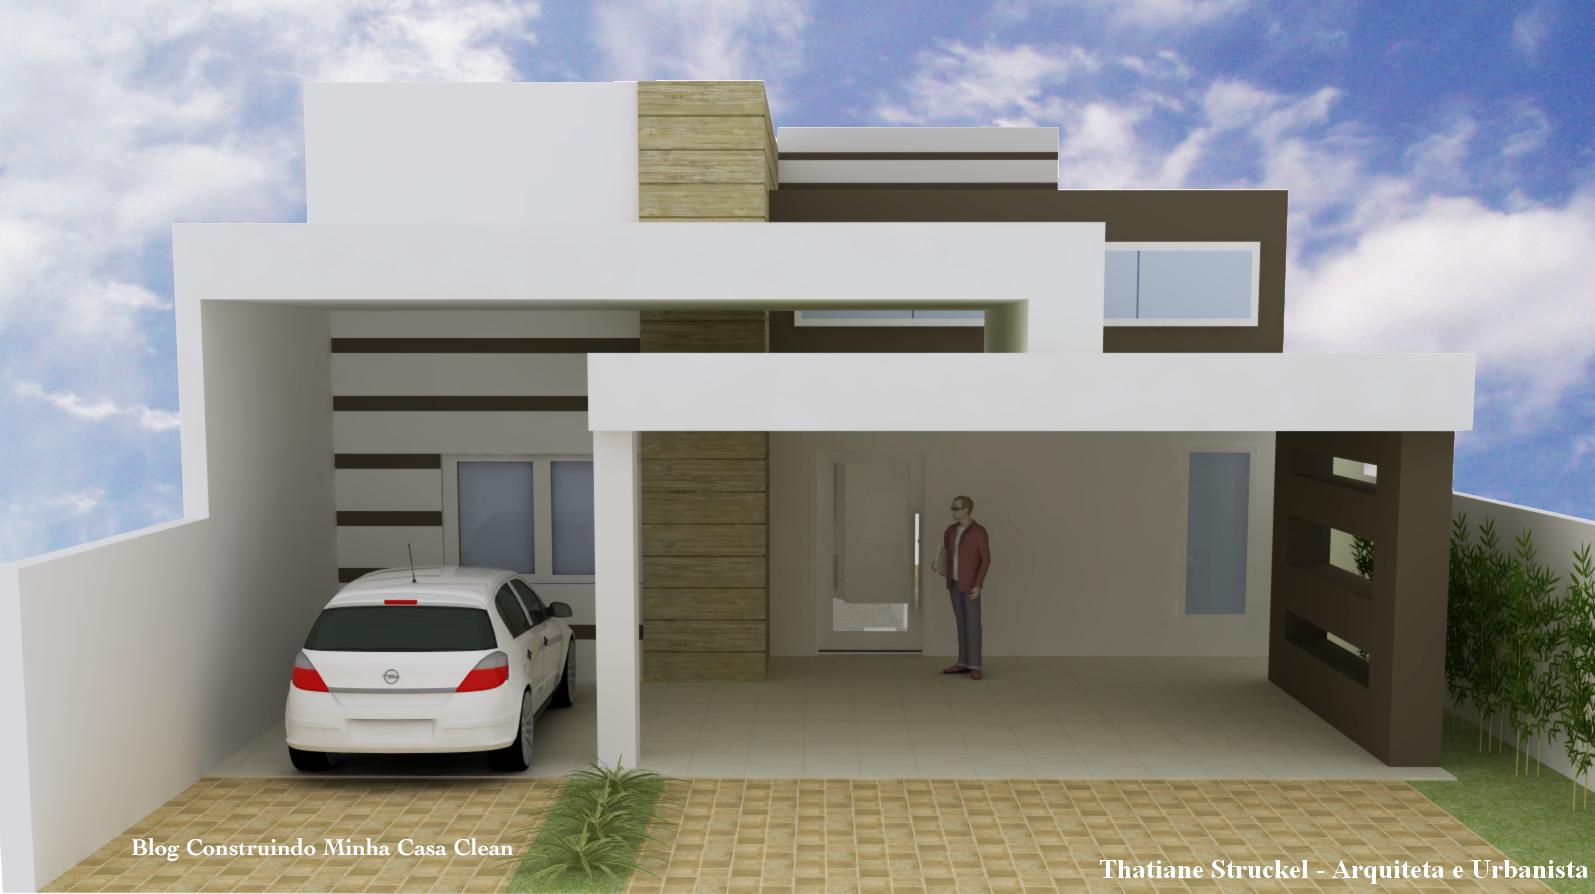 Construindo minha casa clean fachadas de casas com - Fachadas casas modernas ...